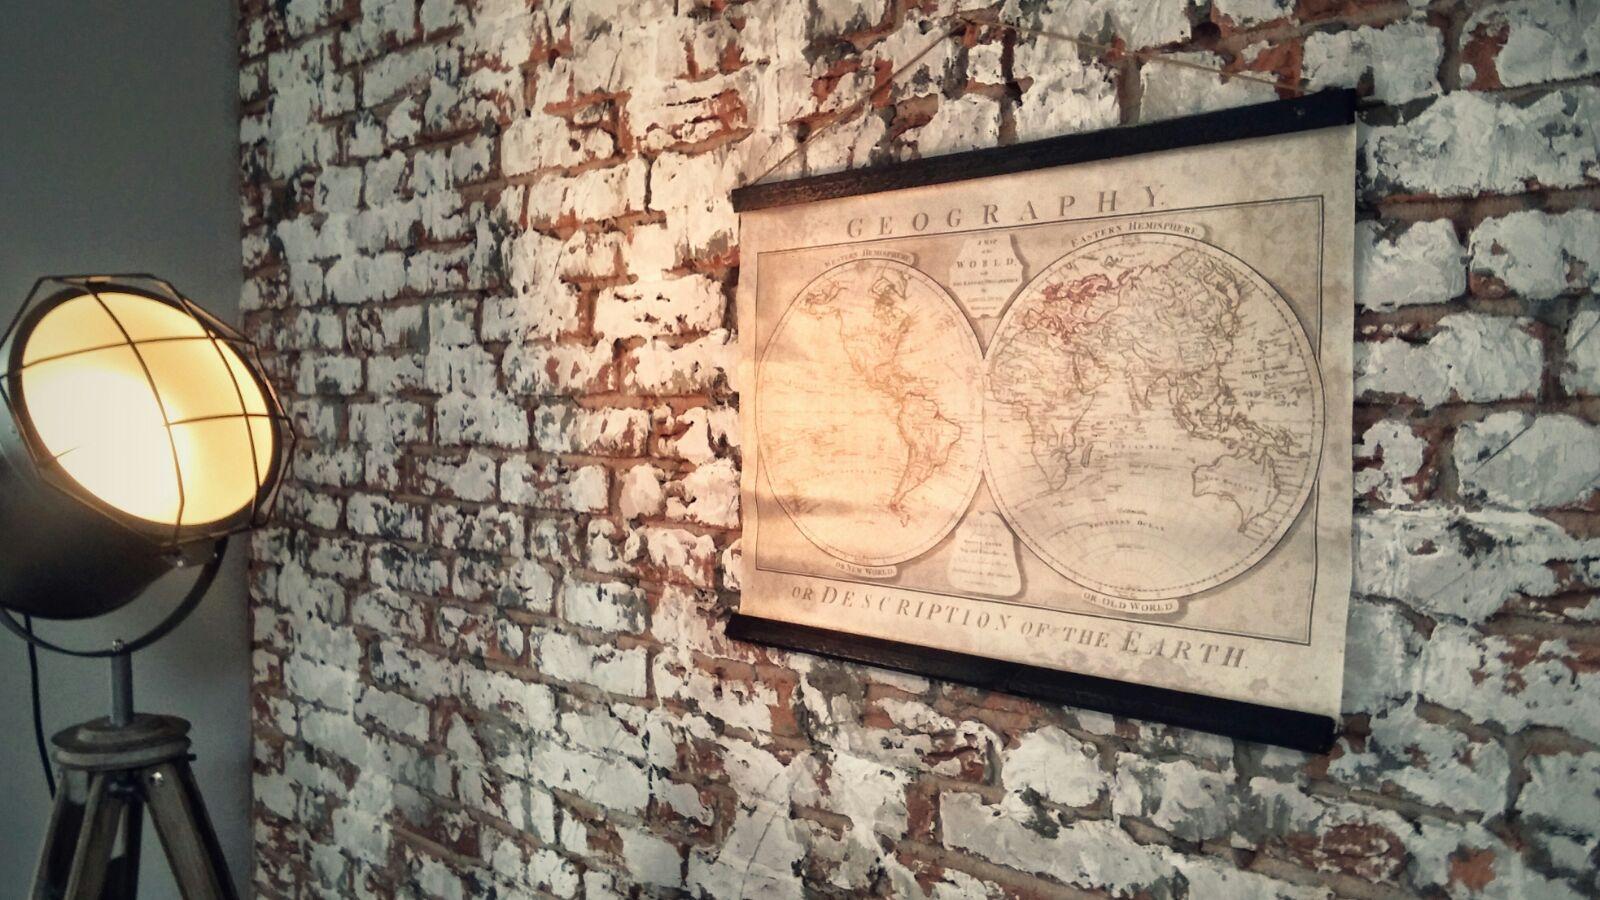 woonkamer interieurstyling industrieel brickwall bakstenen muur vintage poster.jpg